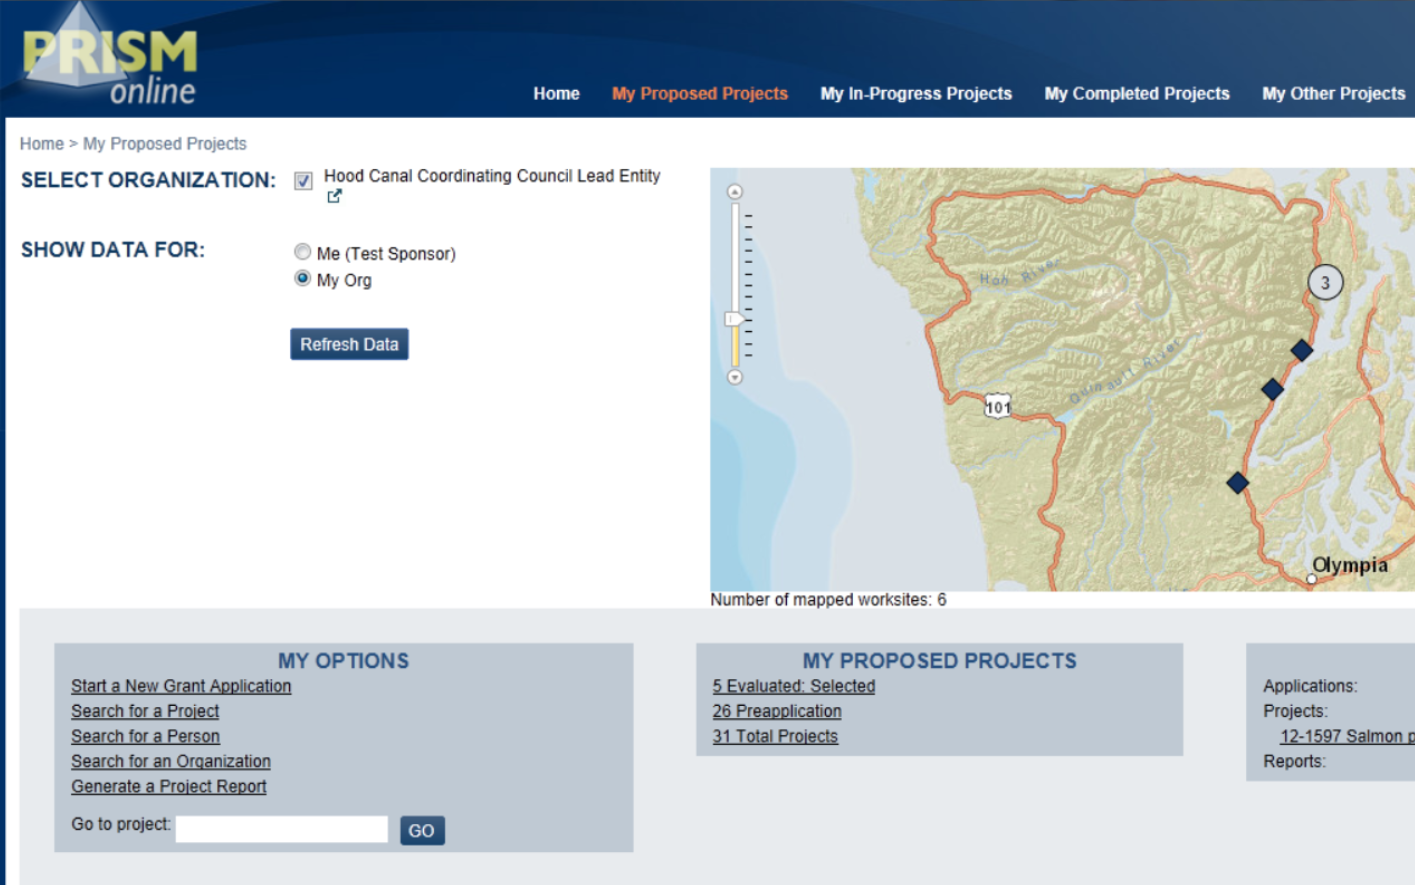 RCO PRISM home page ux ui design overhaul